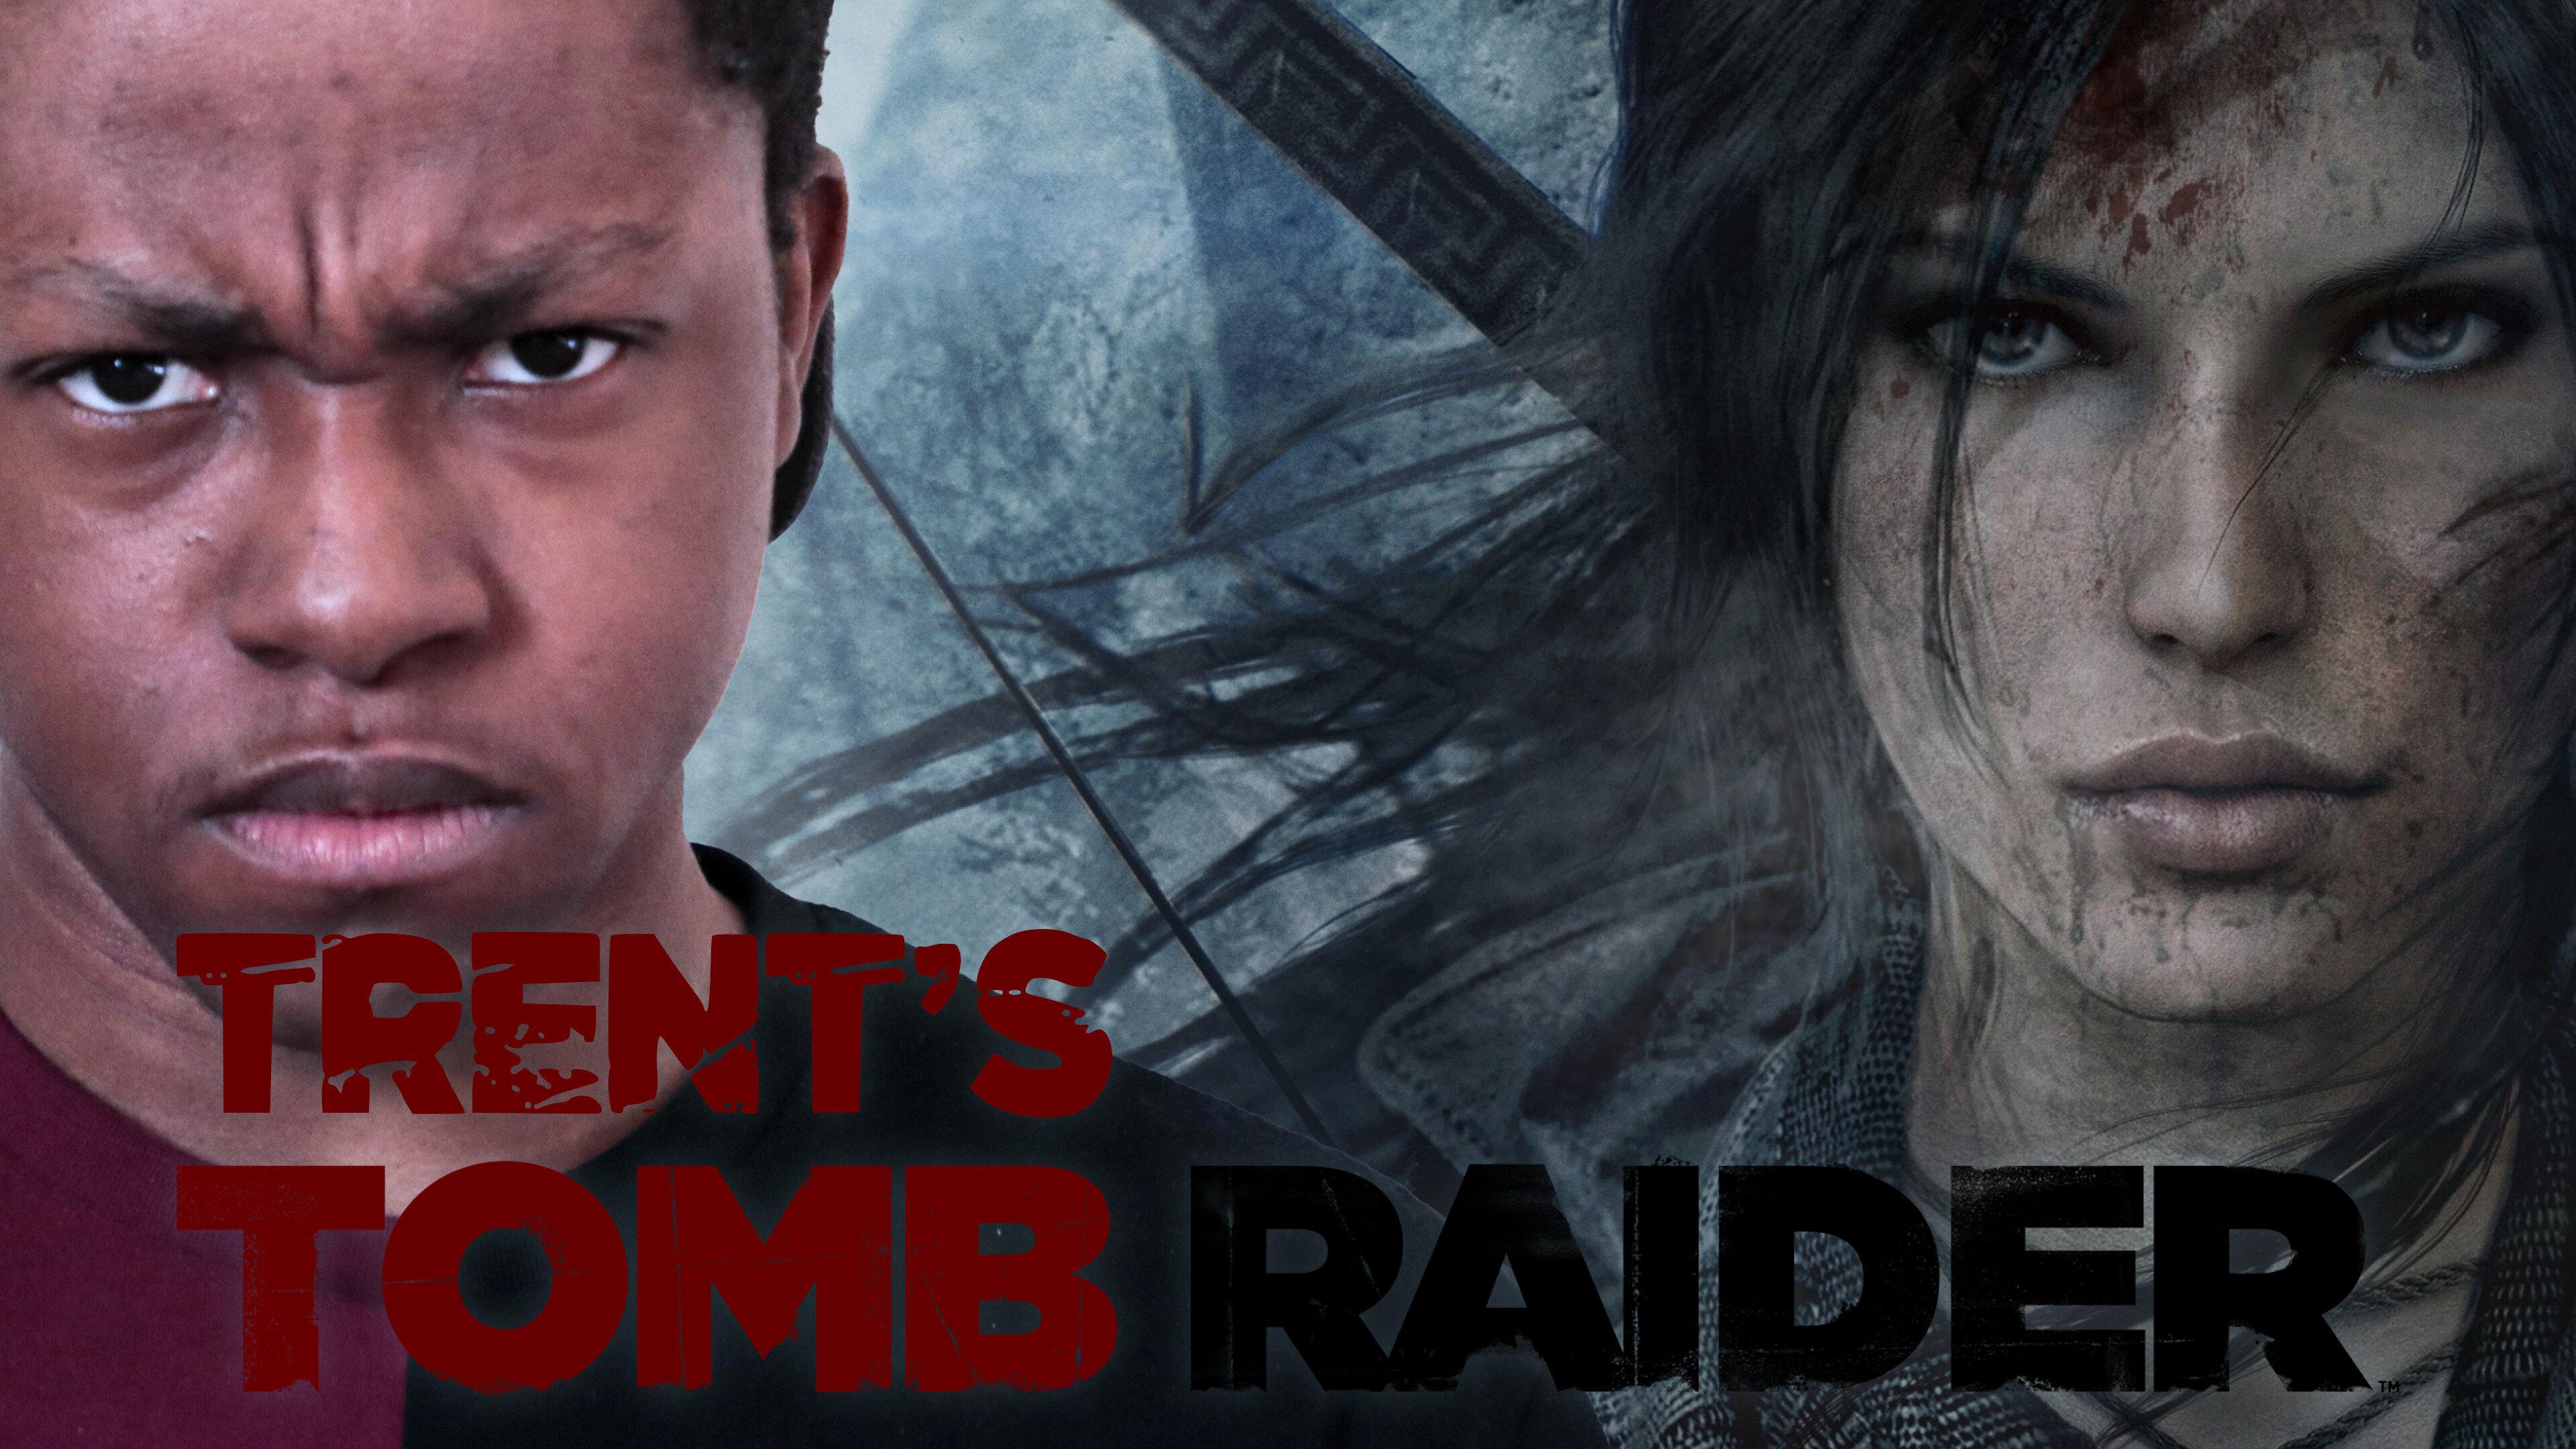 Trent's Tomb Raider